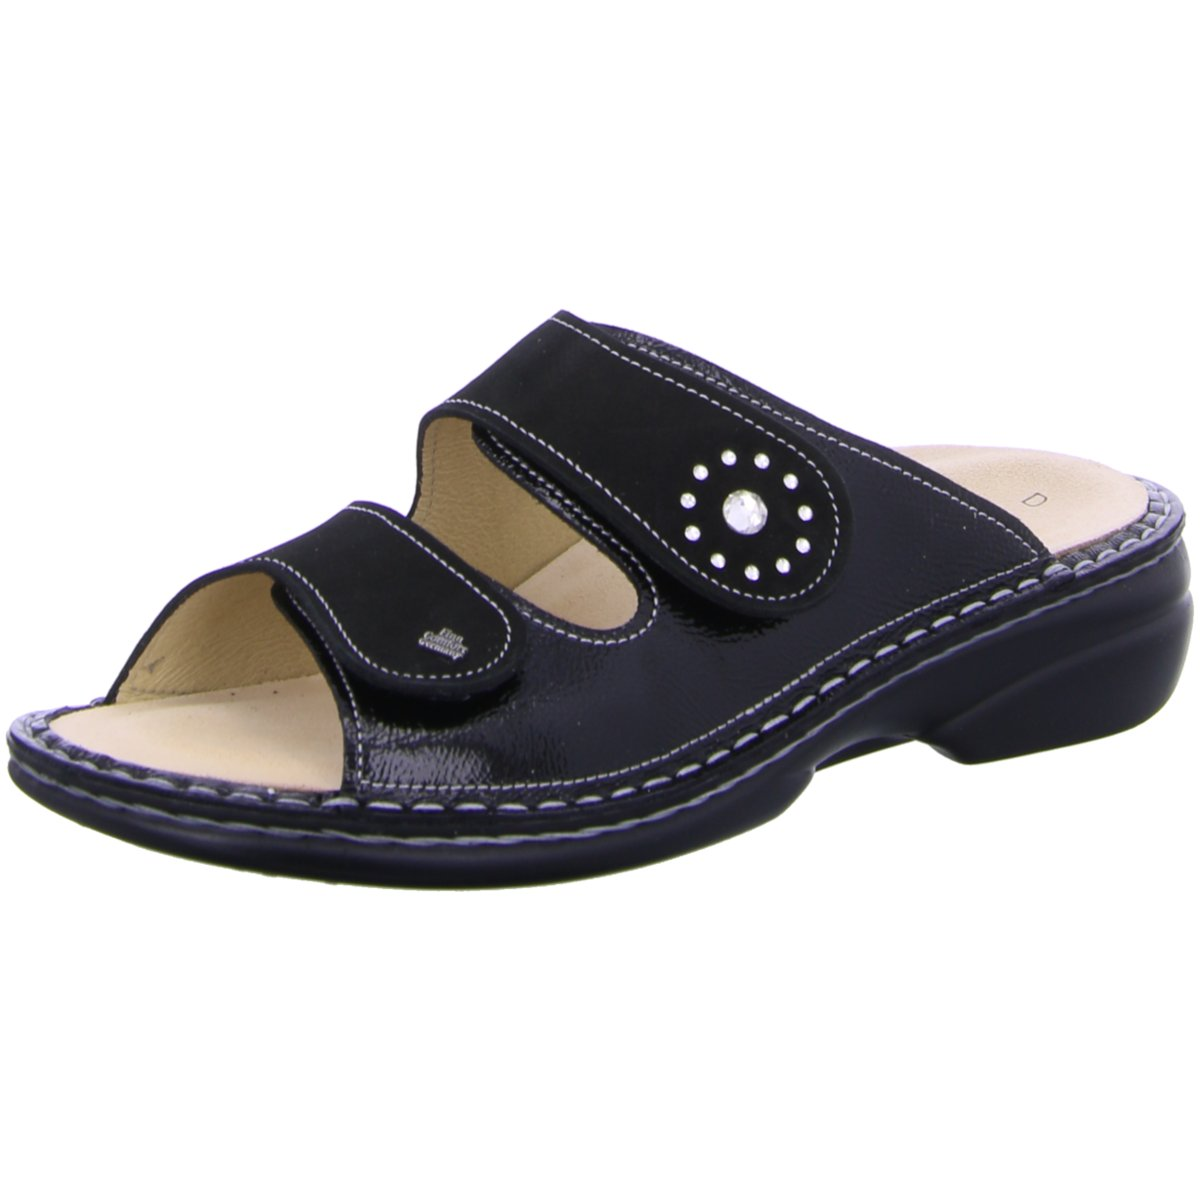 FinnComfort Damen Pantoletten BEVERLY-S 900618 schwarz 246284